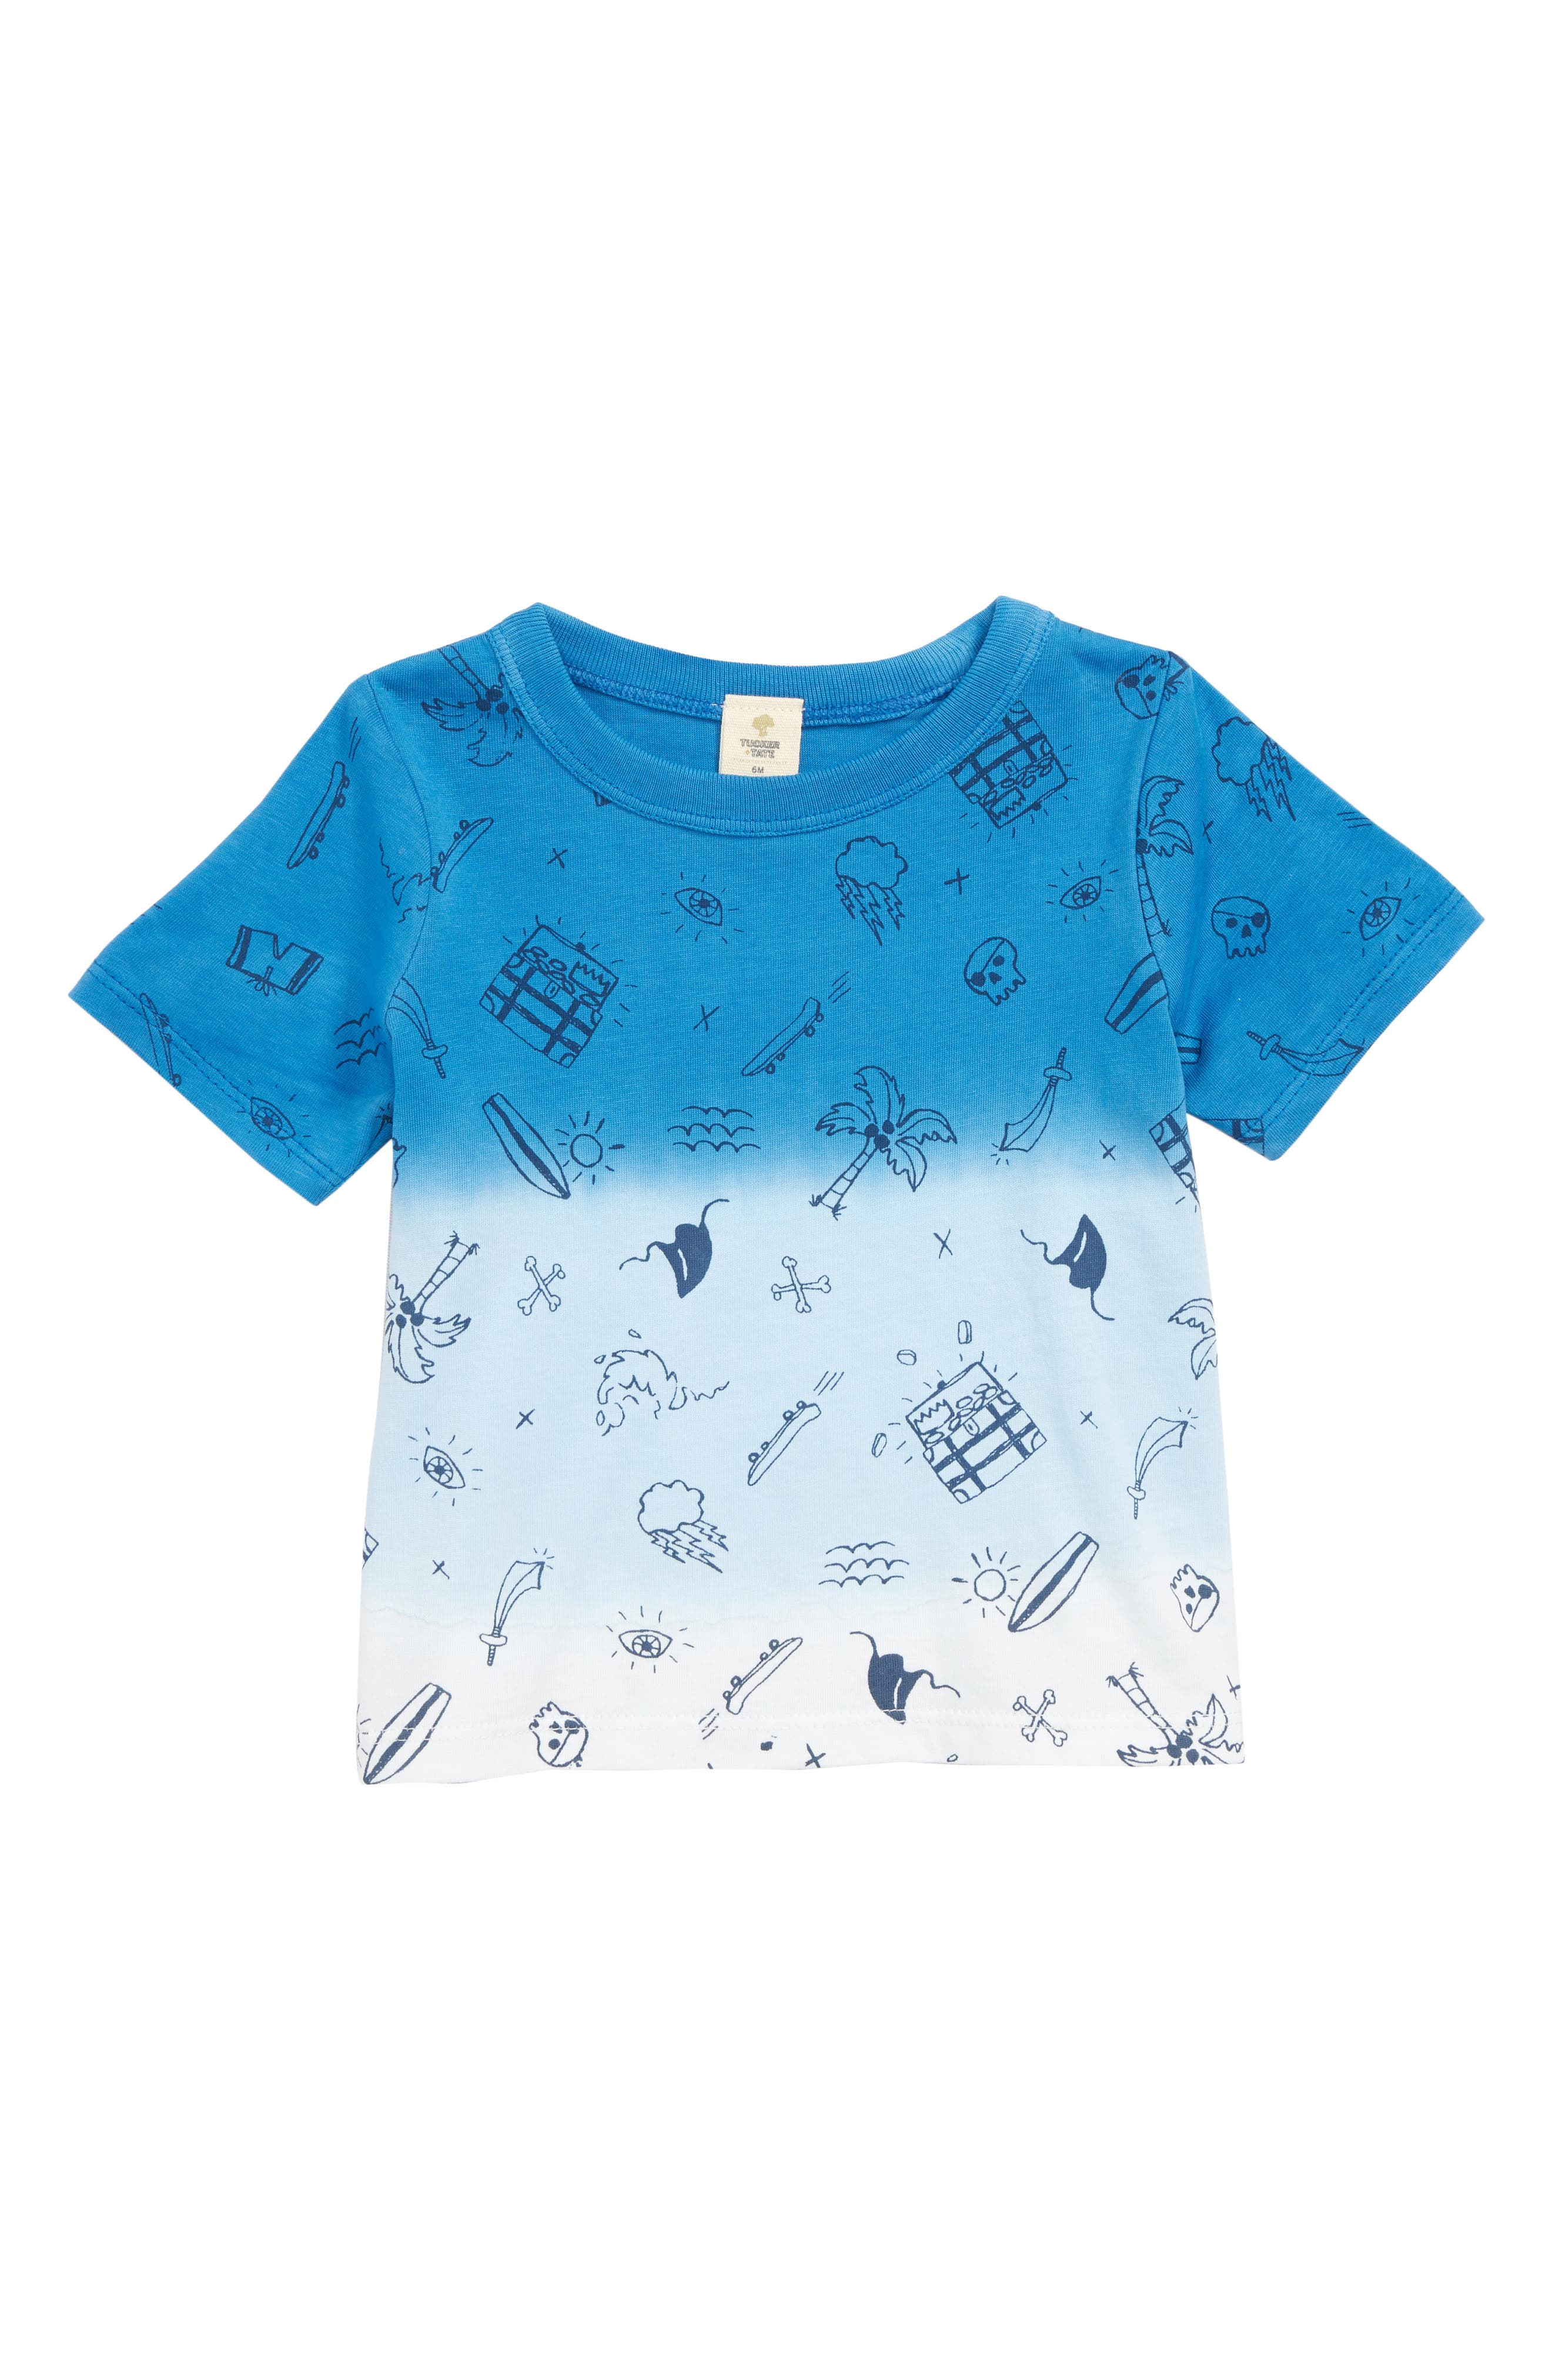 TUCKER + TATE Ombré T-Shirt, Main, color, 401